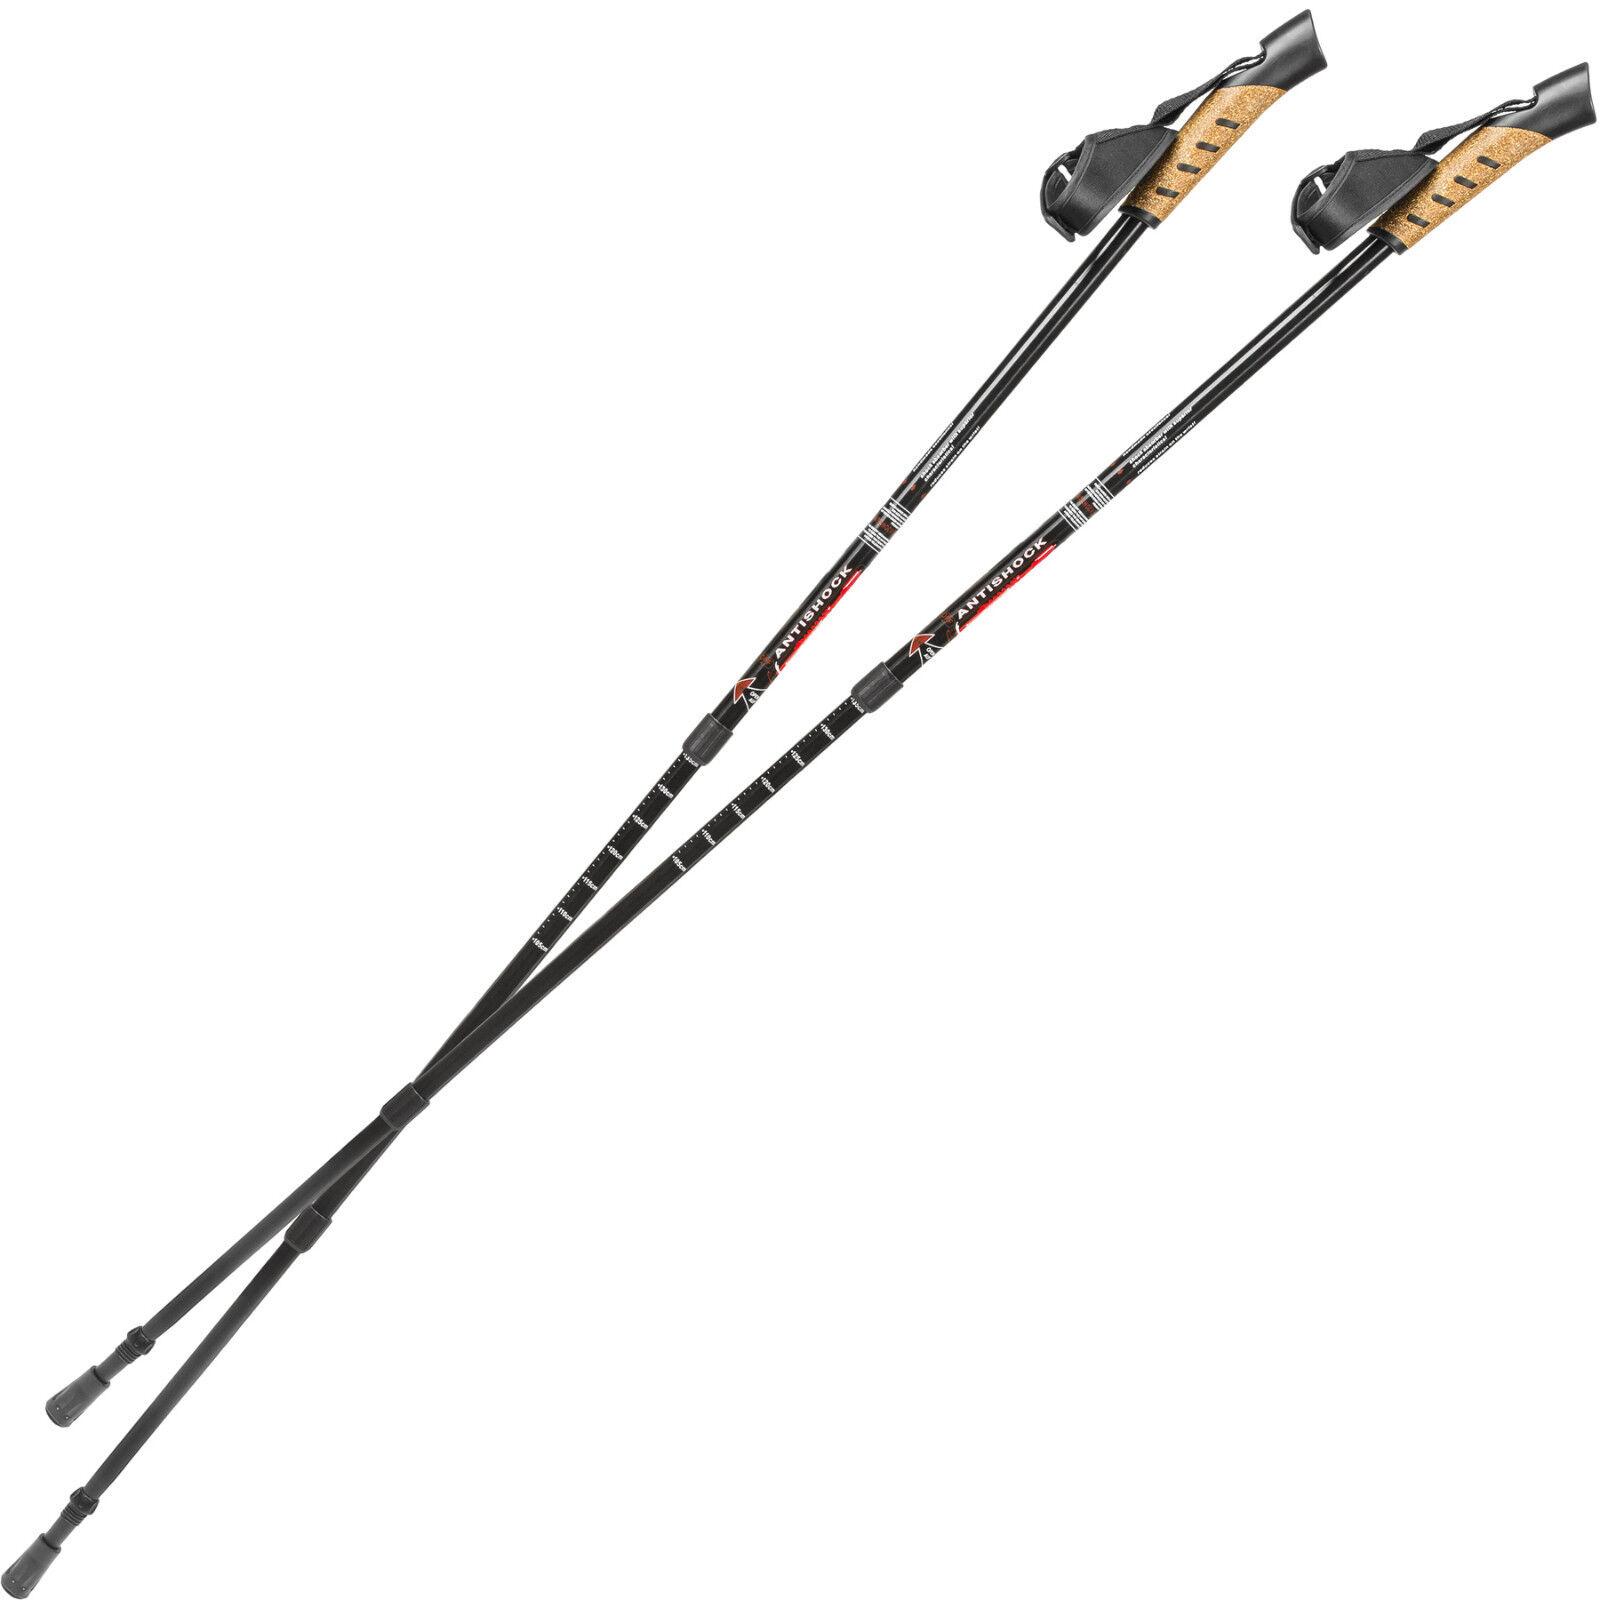 Pair Nordic Walking sticks with anti-shock telescopic poles trekking schwarz new